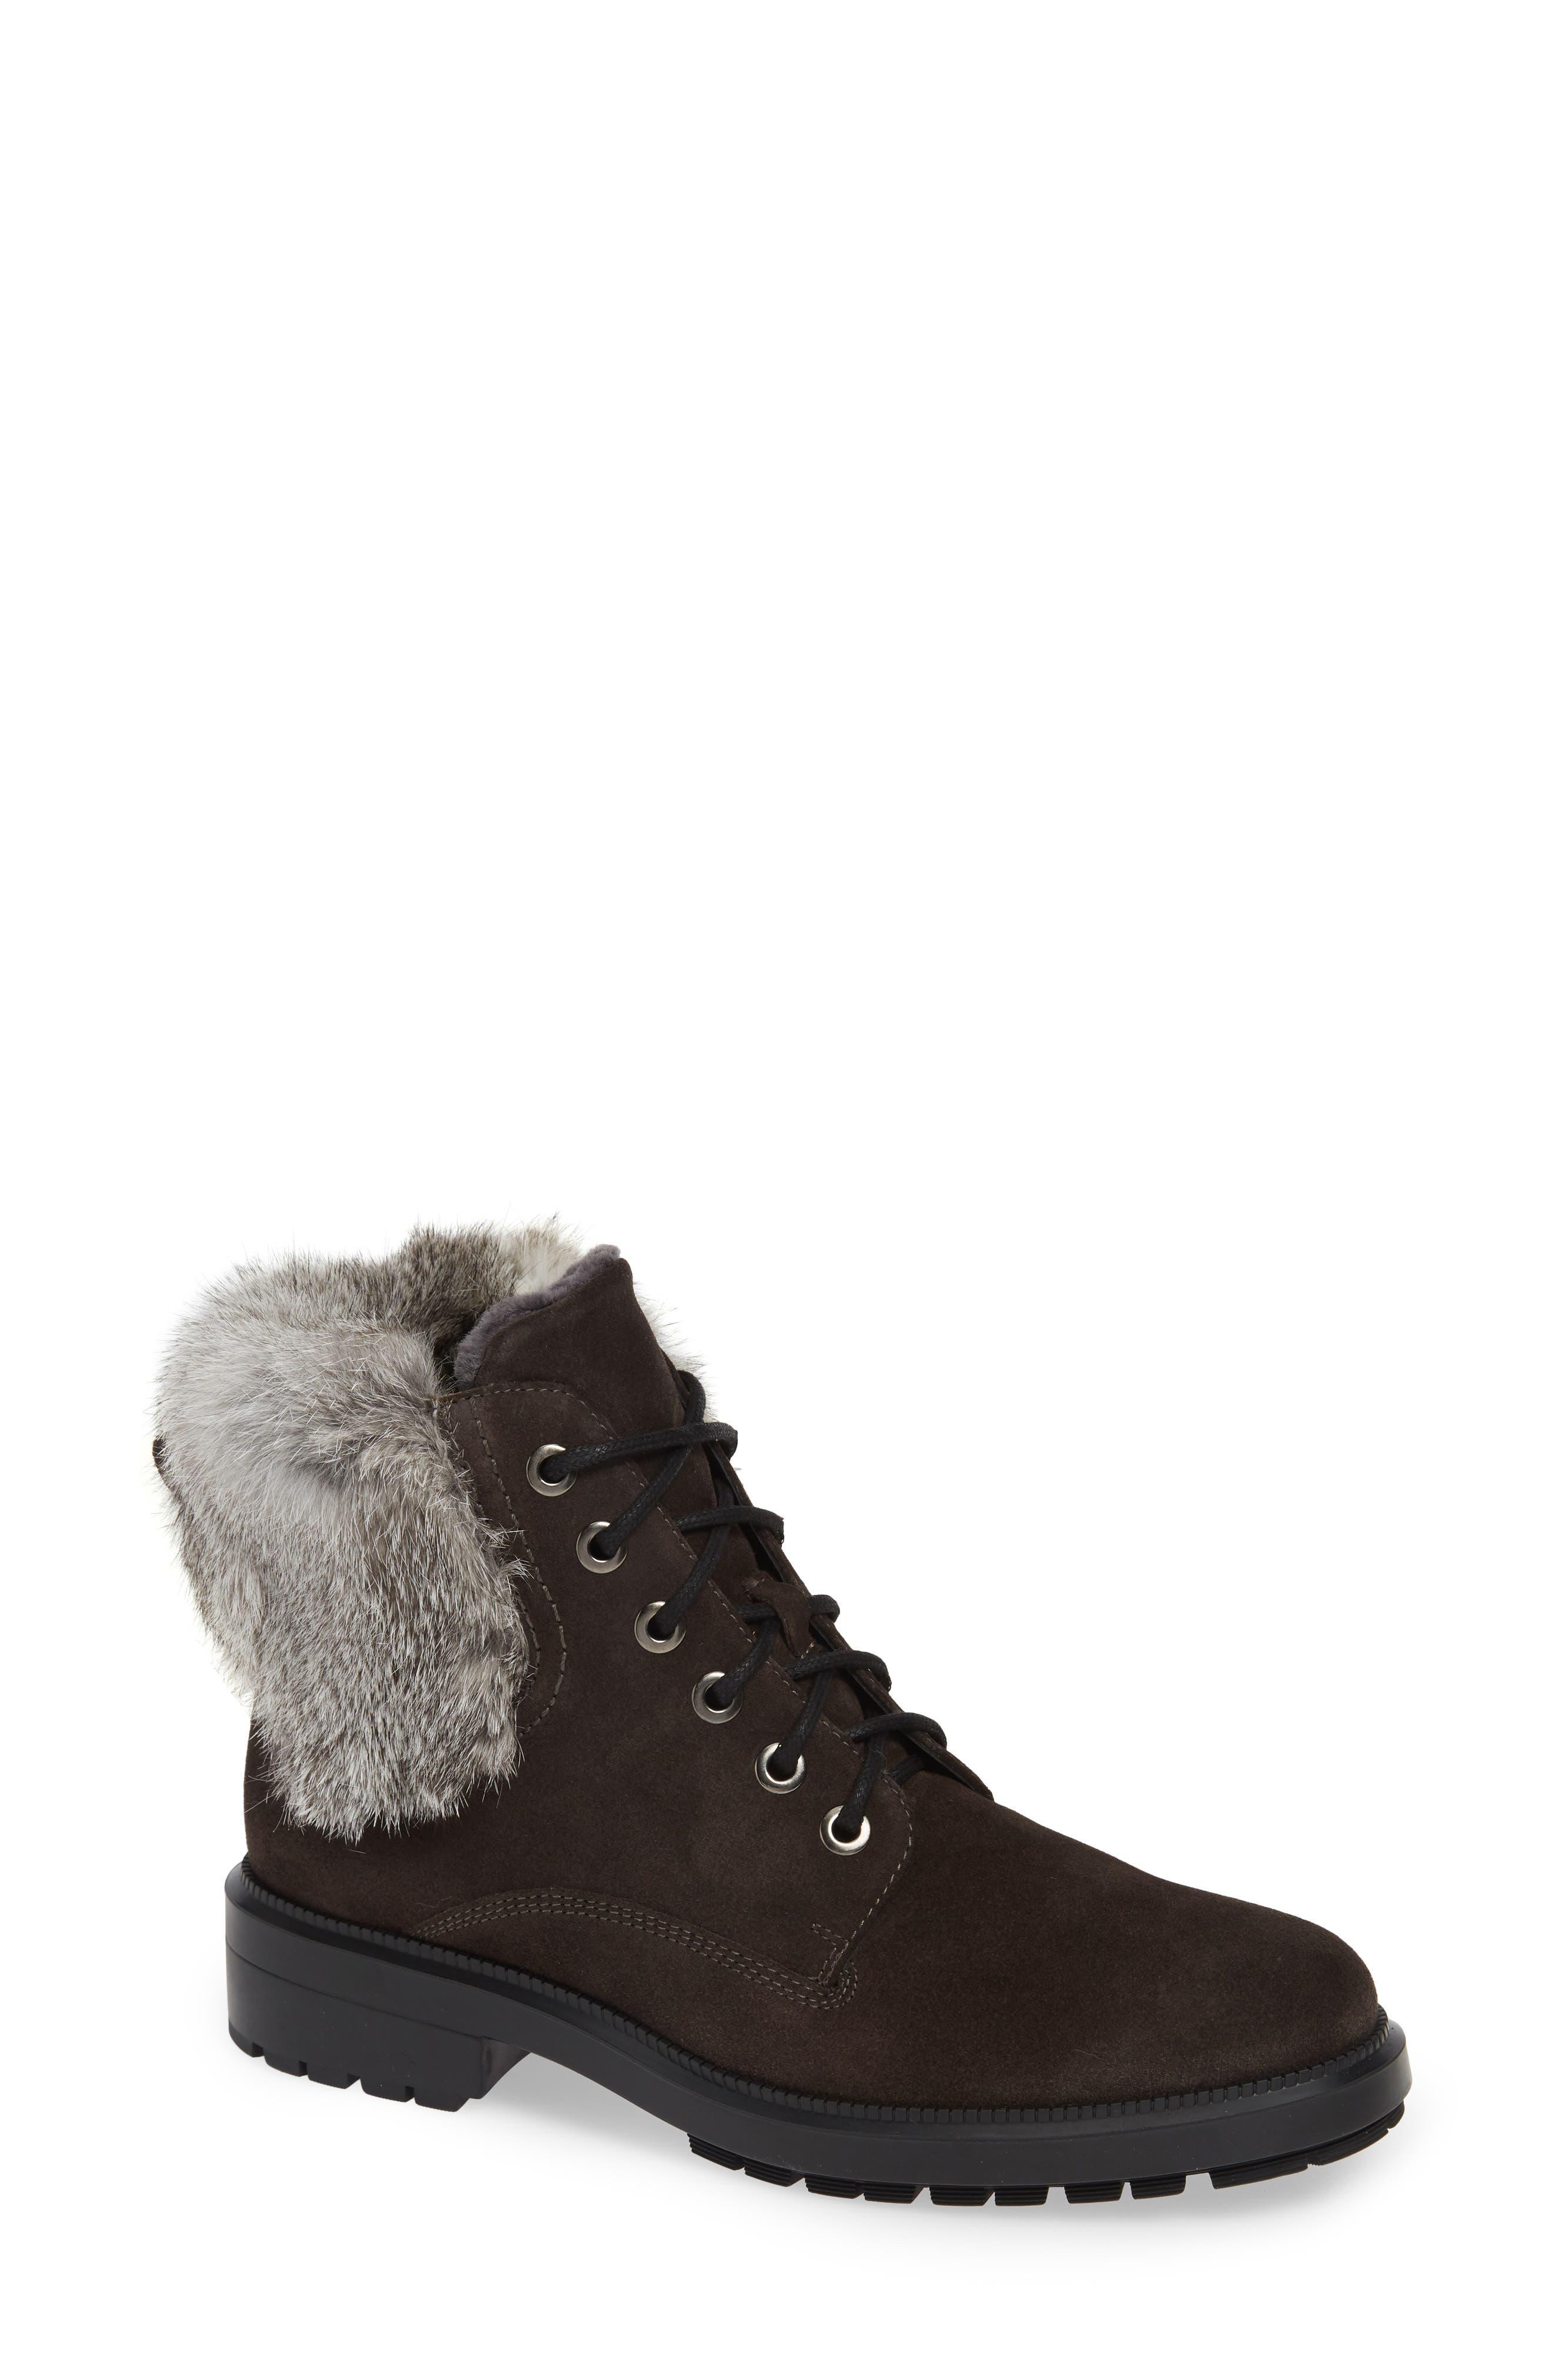 Aquatalia Lacy Genuine Shearling Lined Boot With Genuine Rabbit Fur Trim, Grey